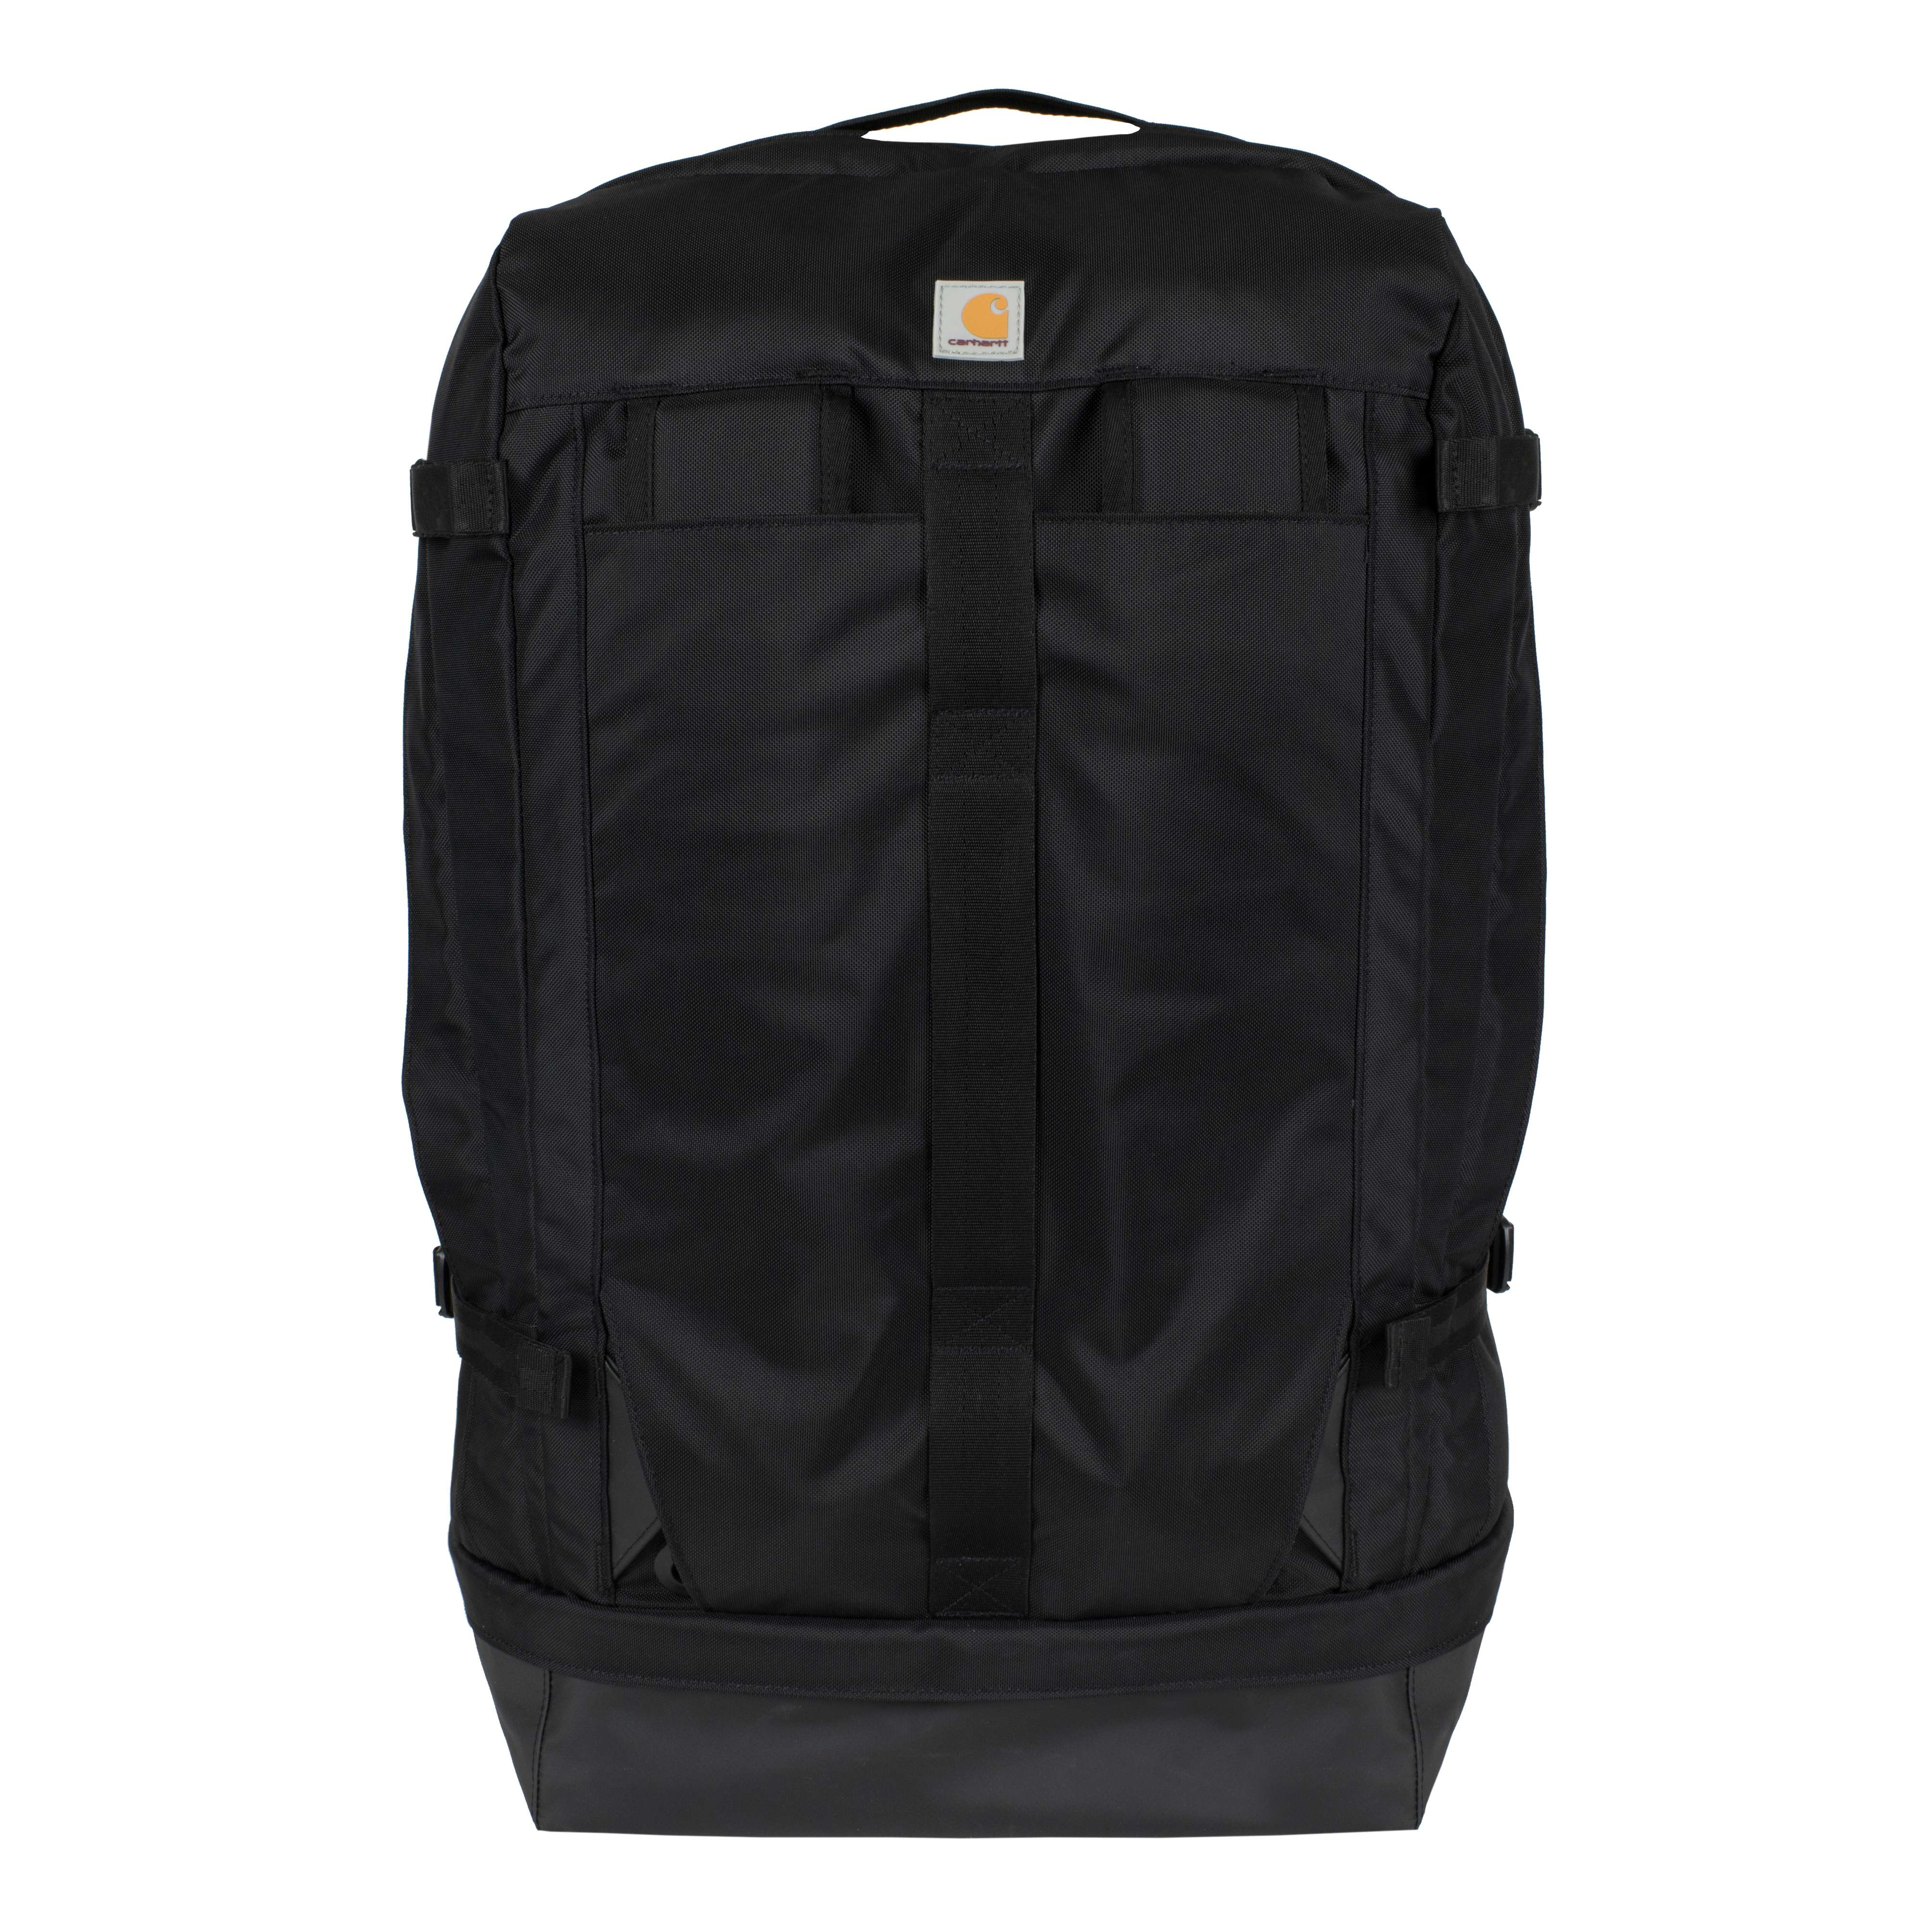 Carhartt Elements 2.0 Duffel / Backpack Hybrid